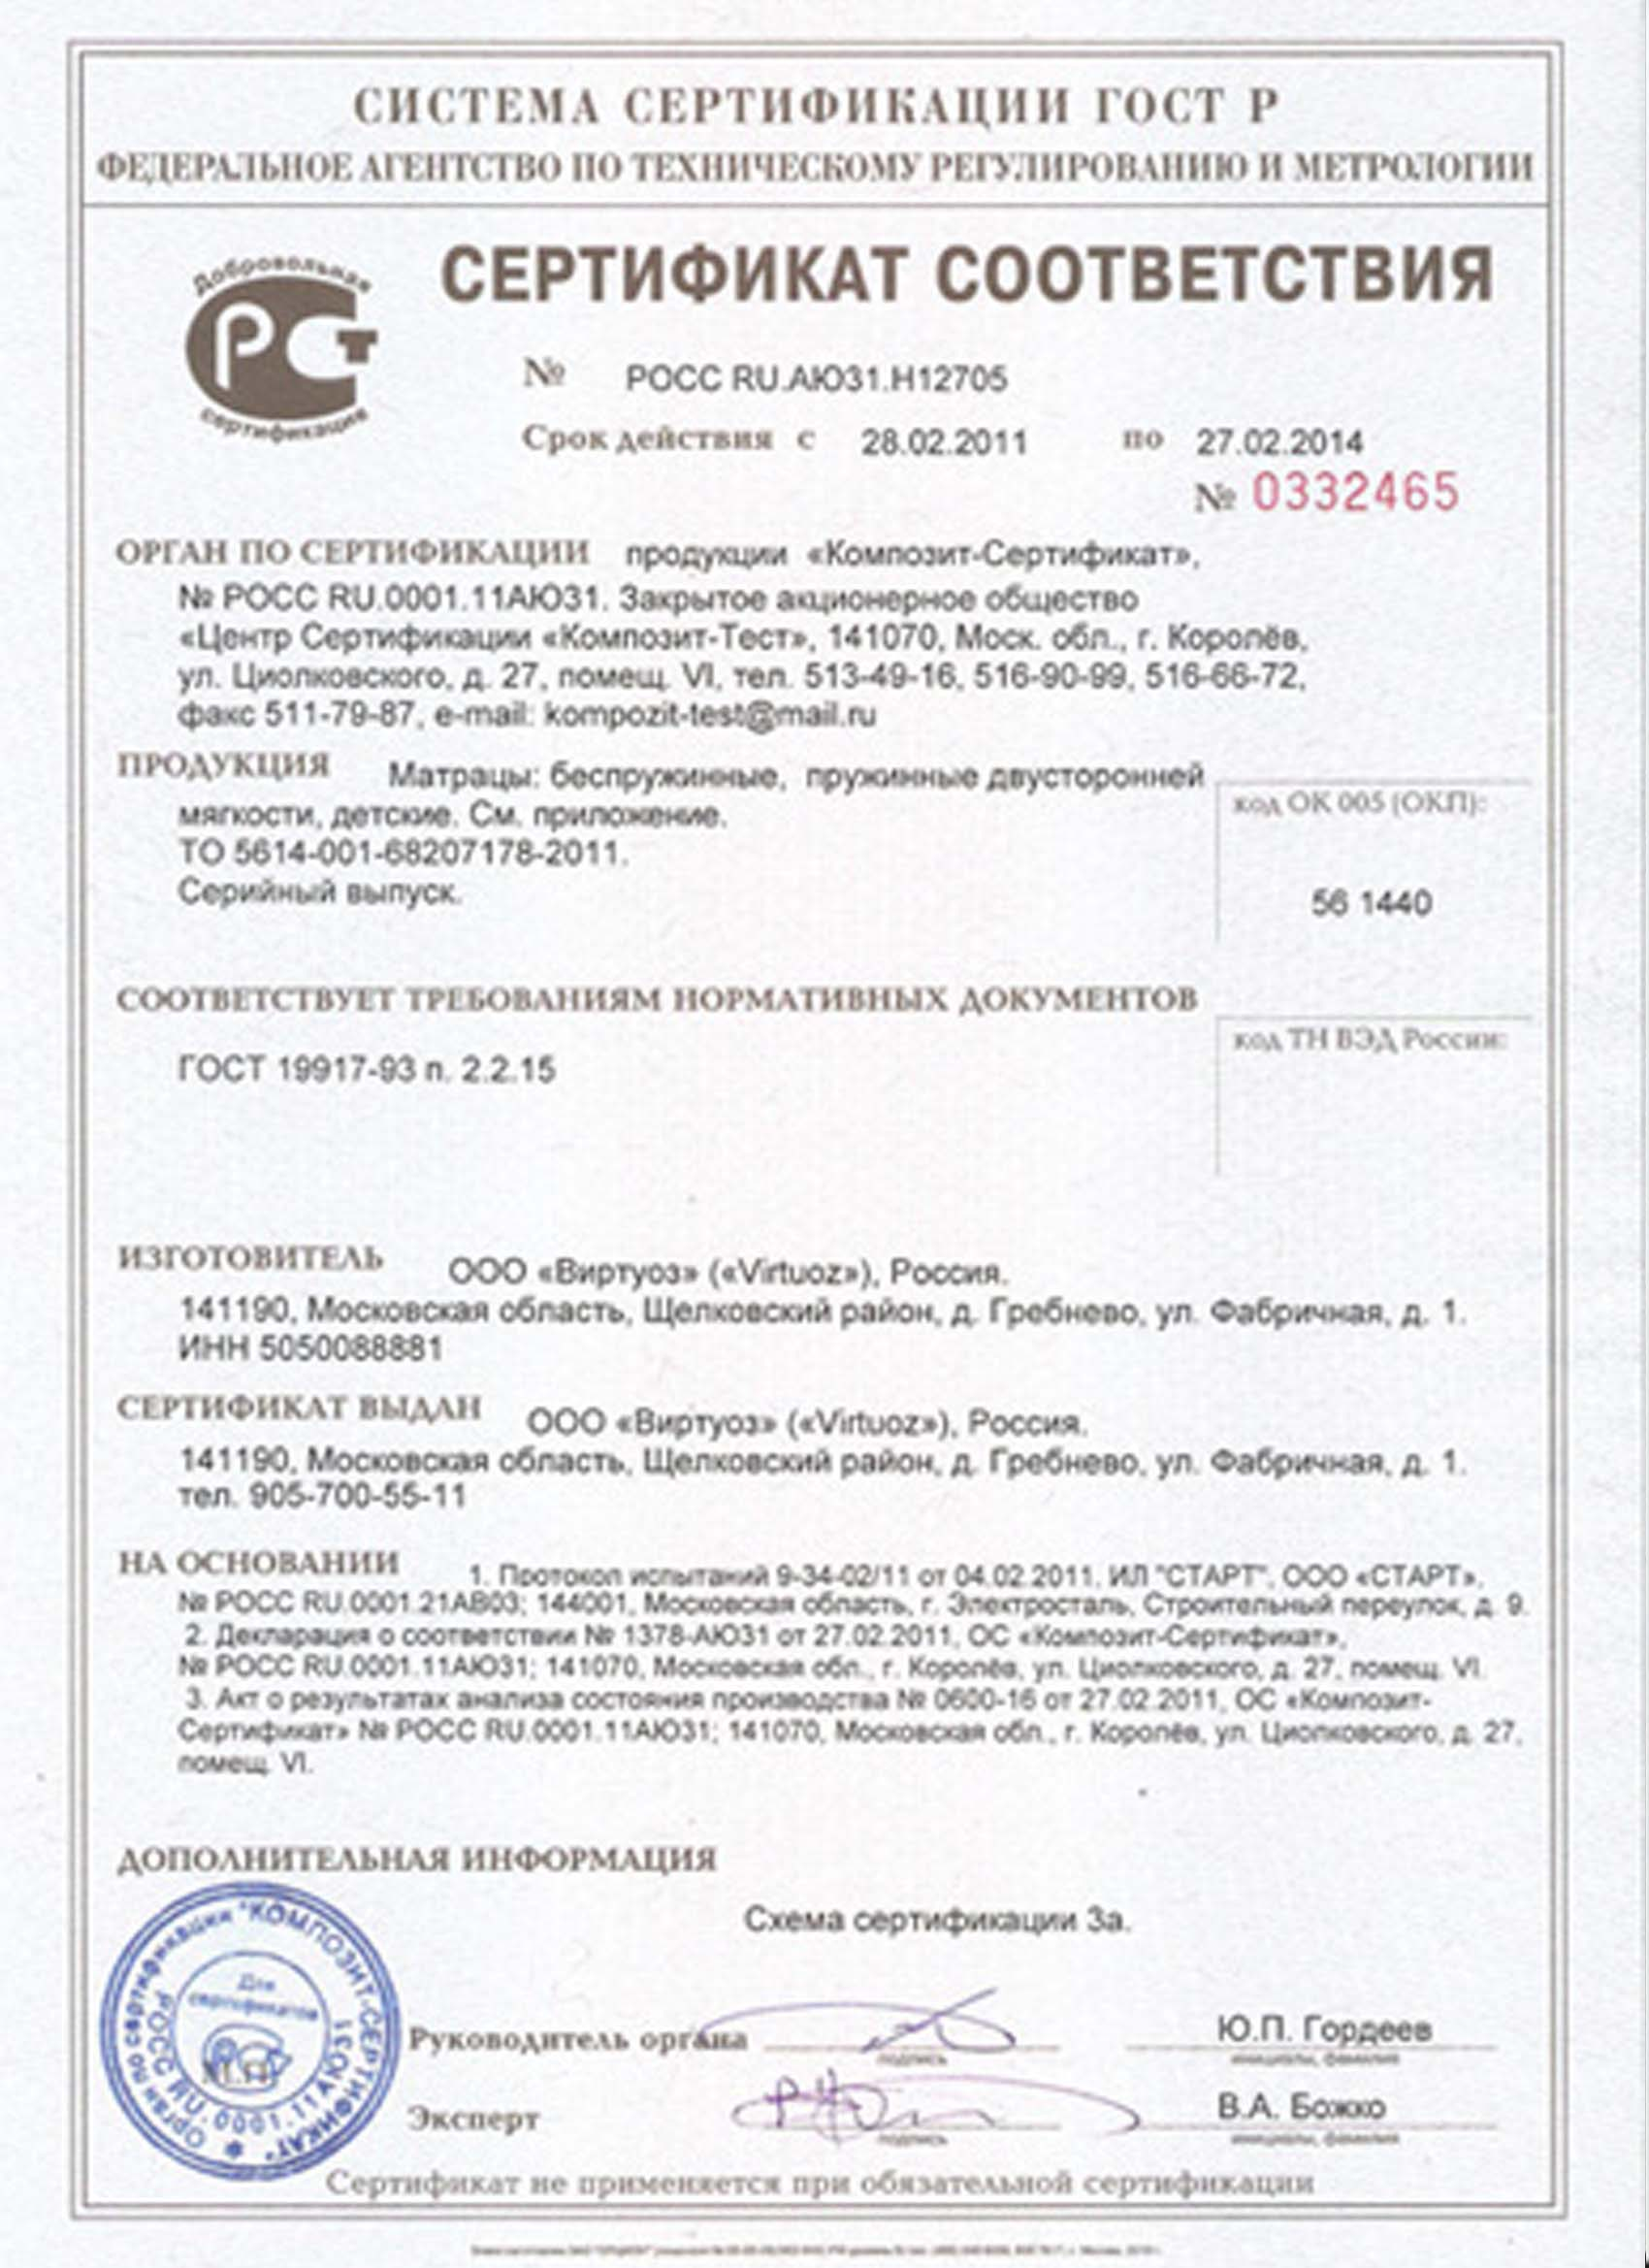 sertifikat_sootvetstviya.jpg